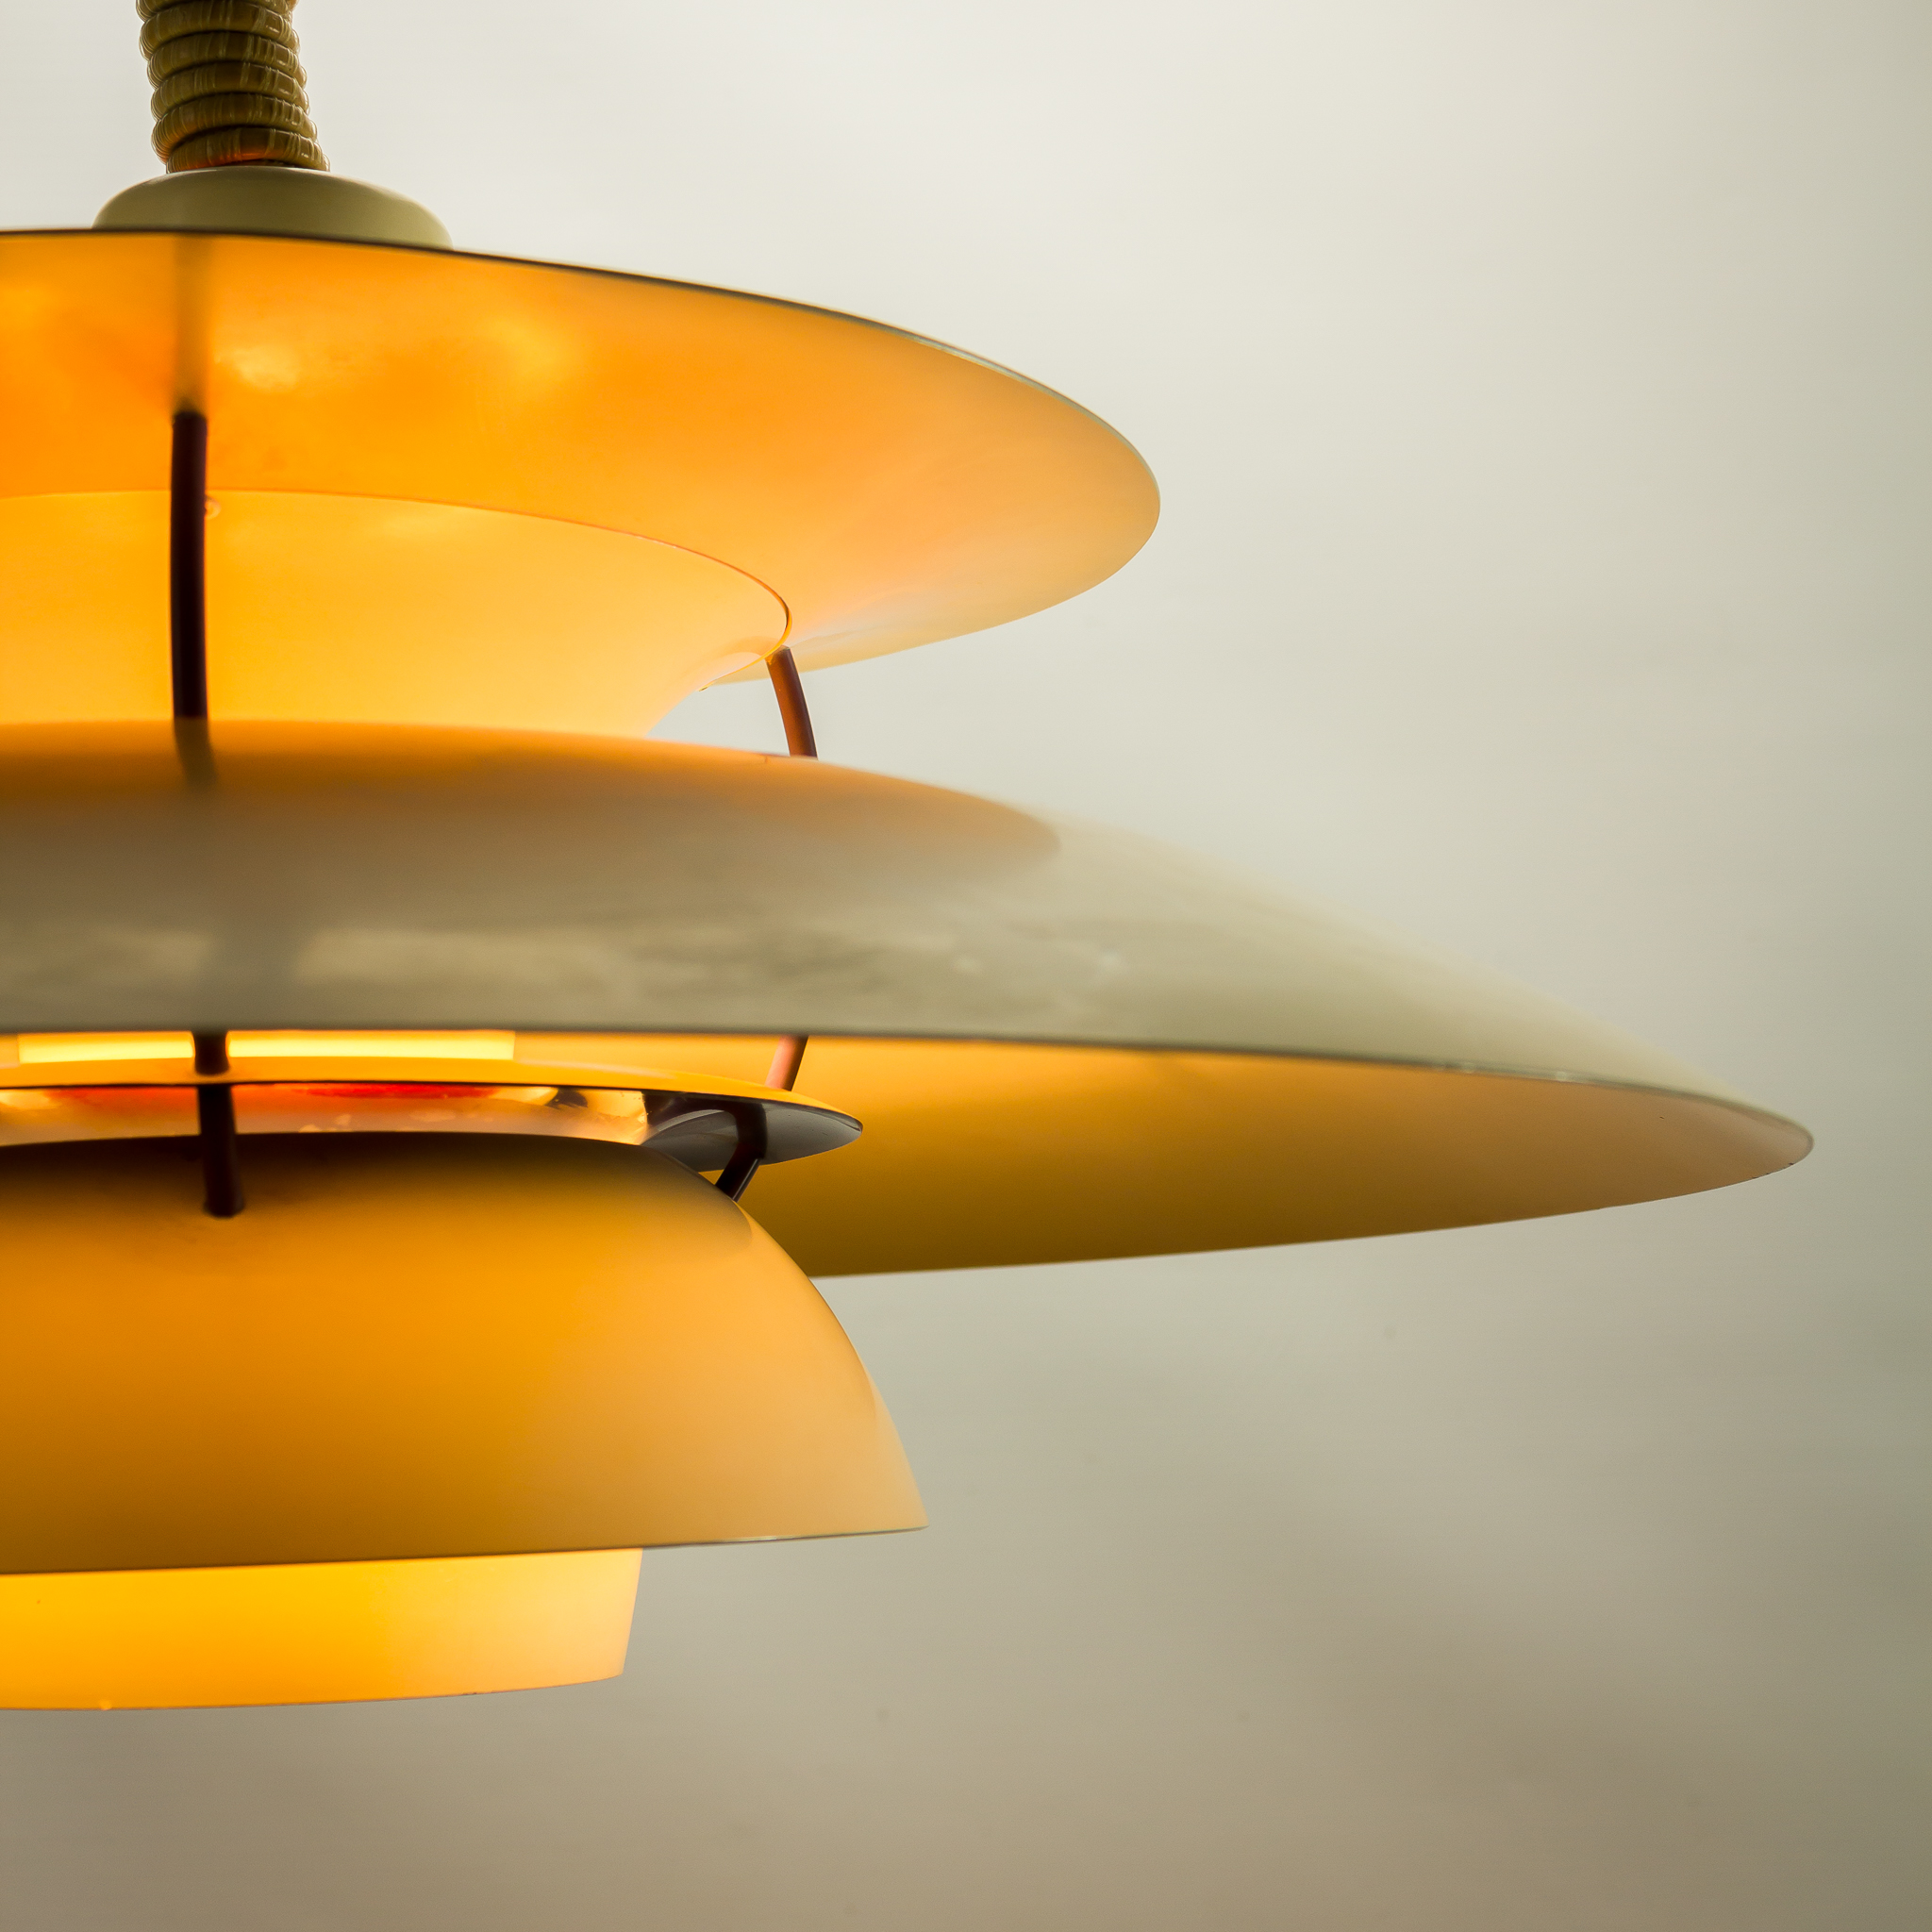 60's Poul Henningsen PH 5 lamp by Louis Poulsen   BarbMama